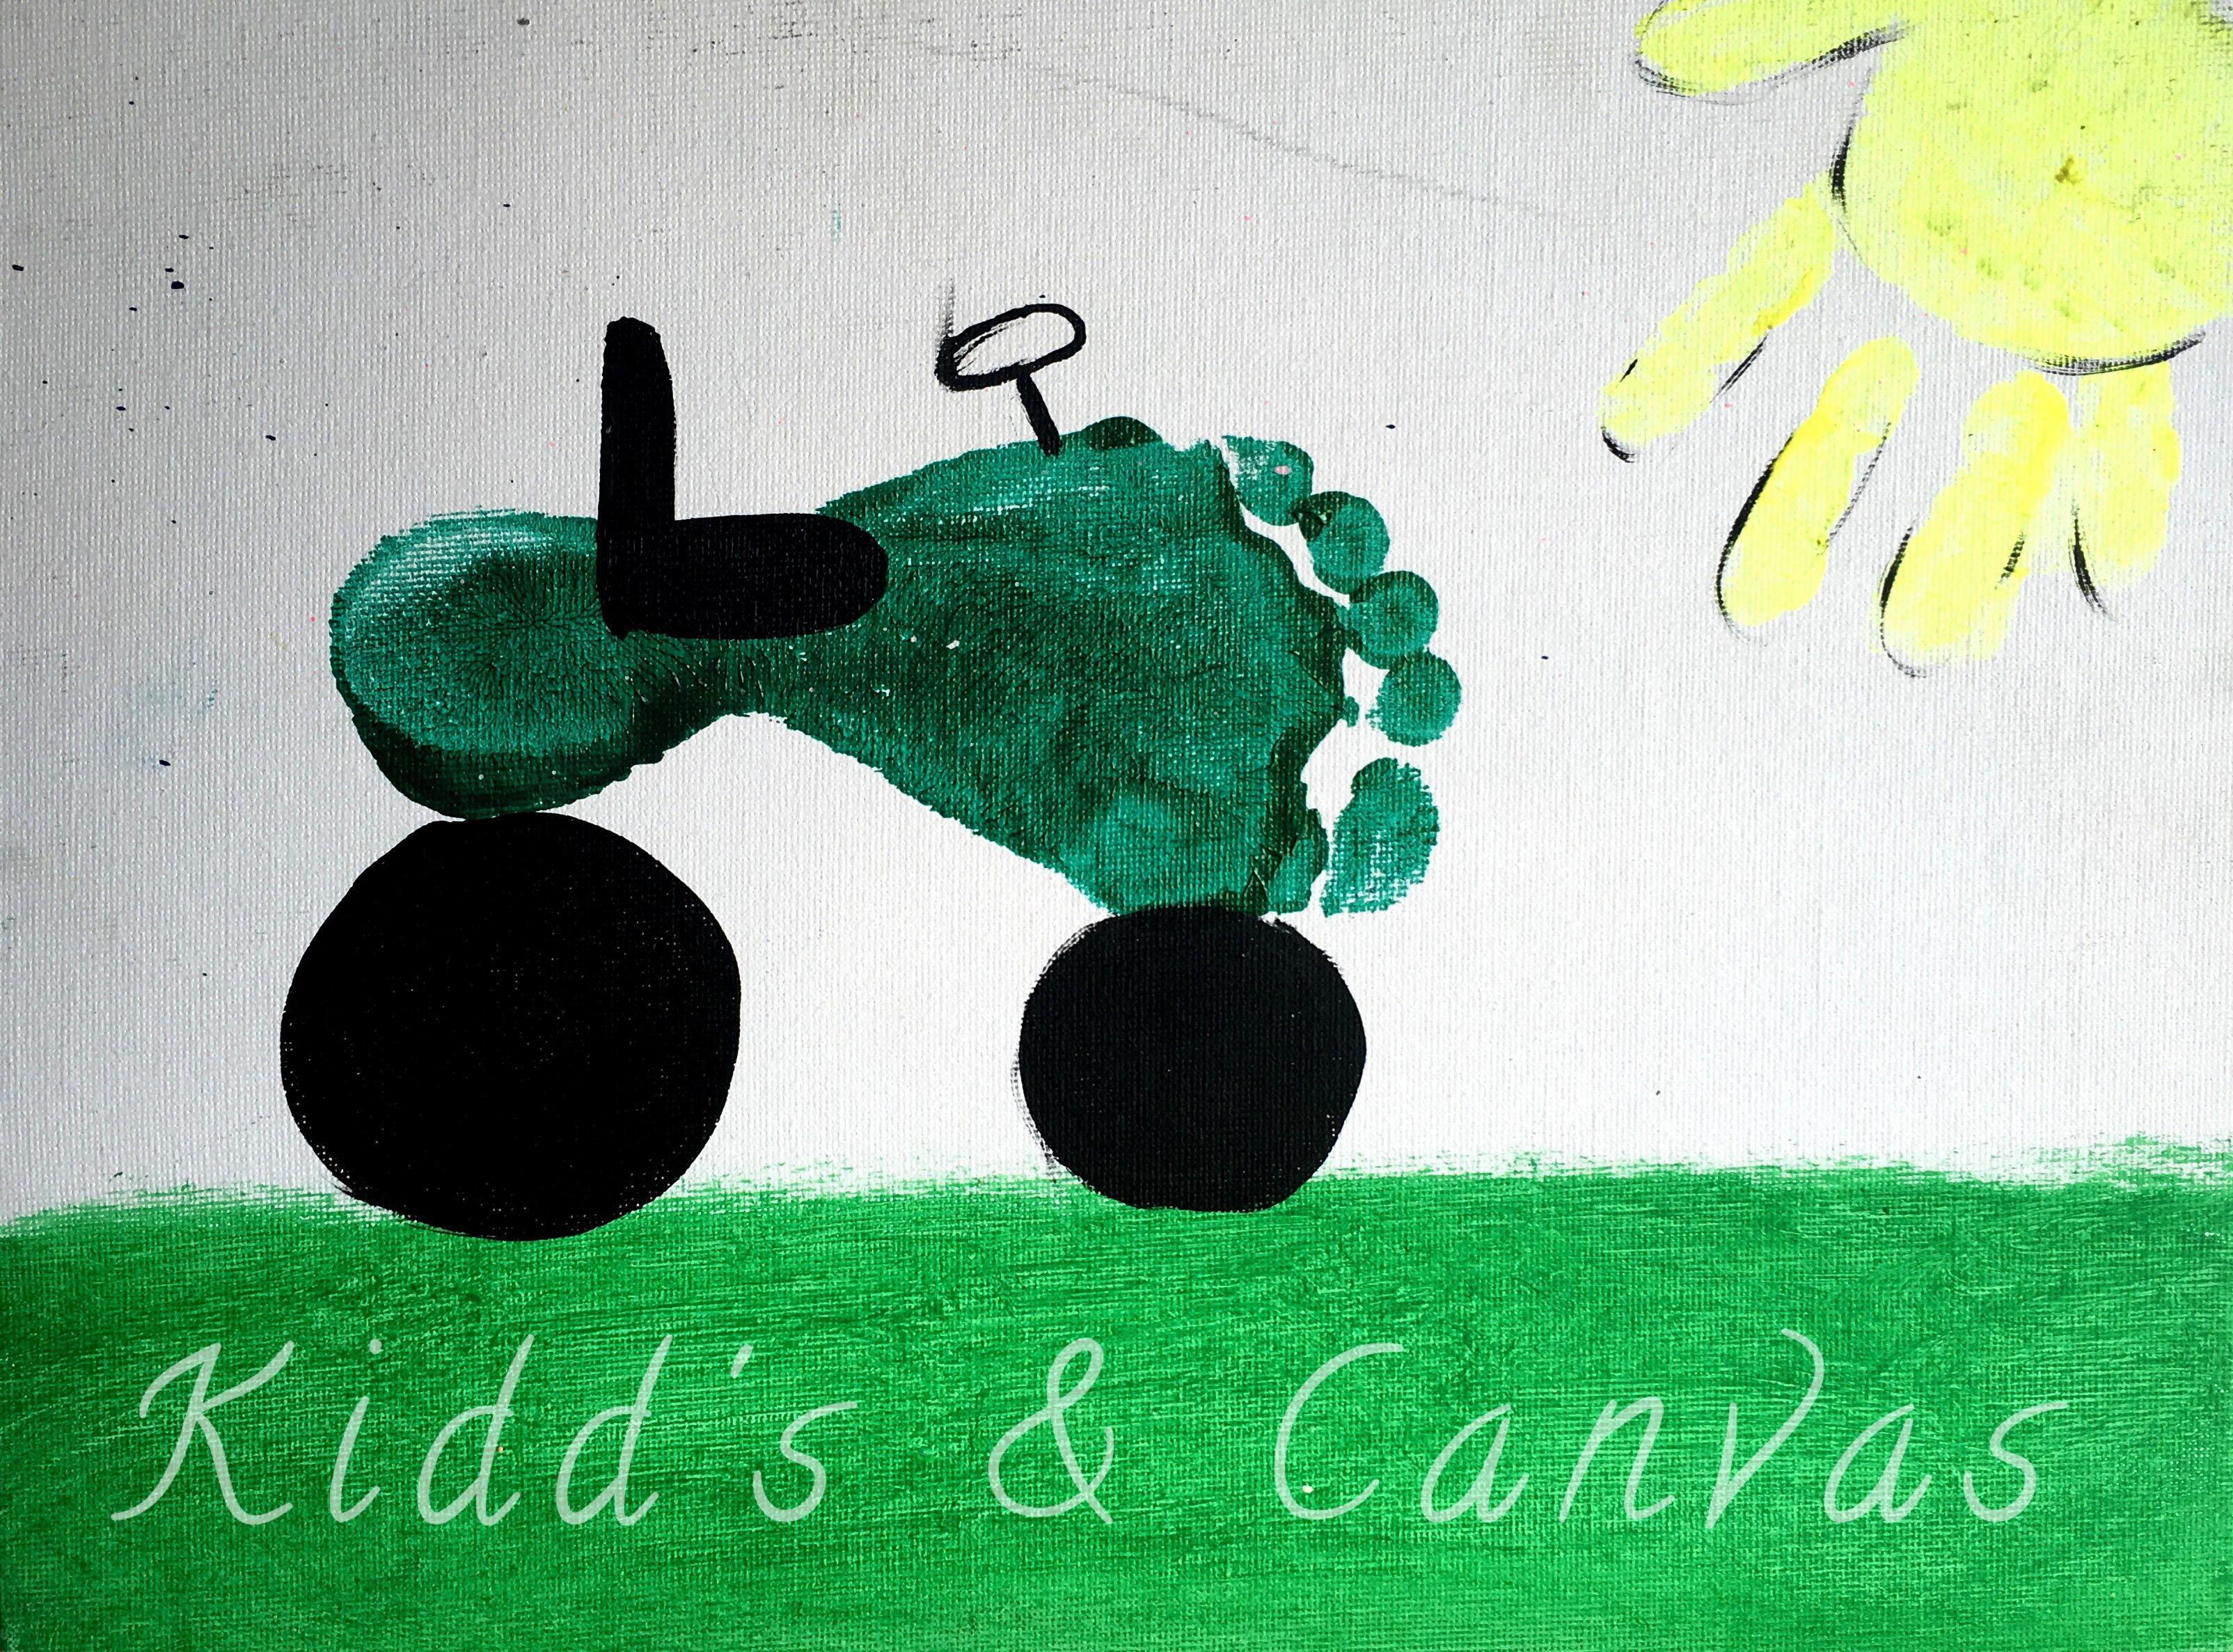 Footprint Tractor